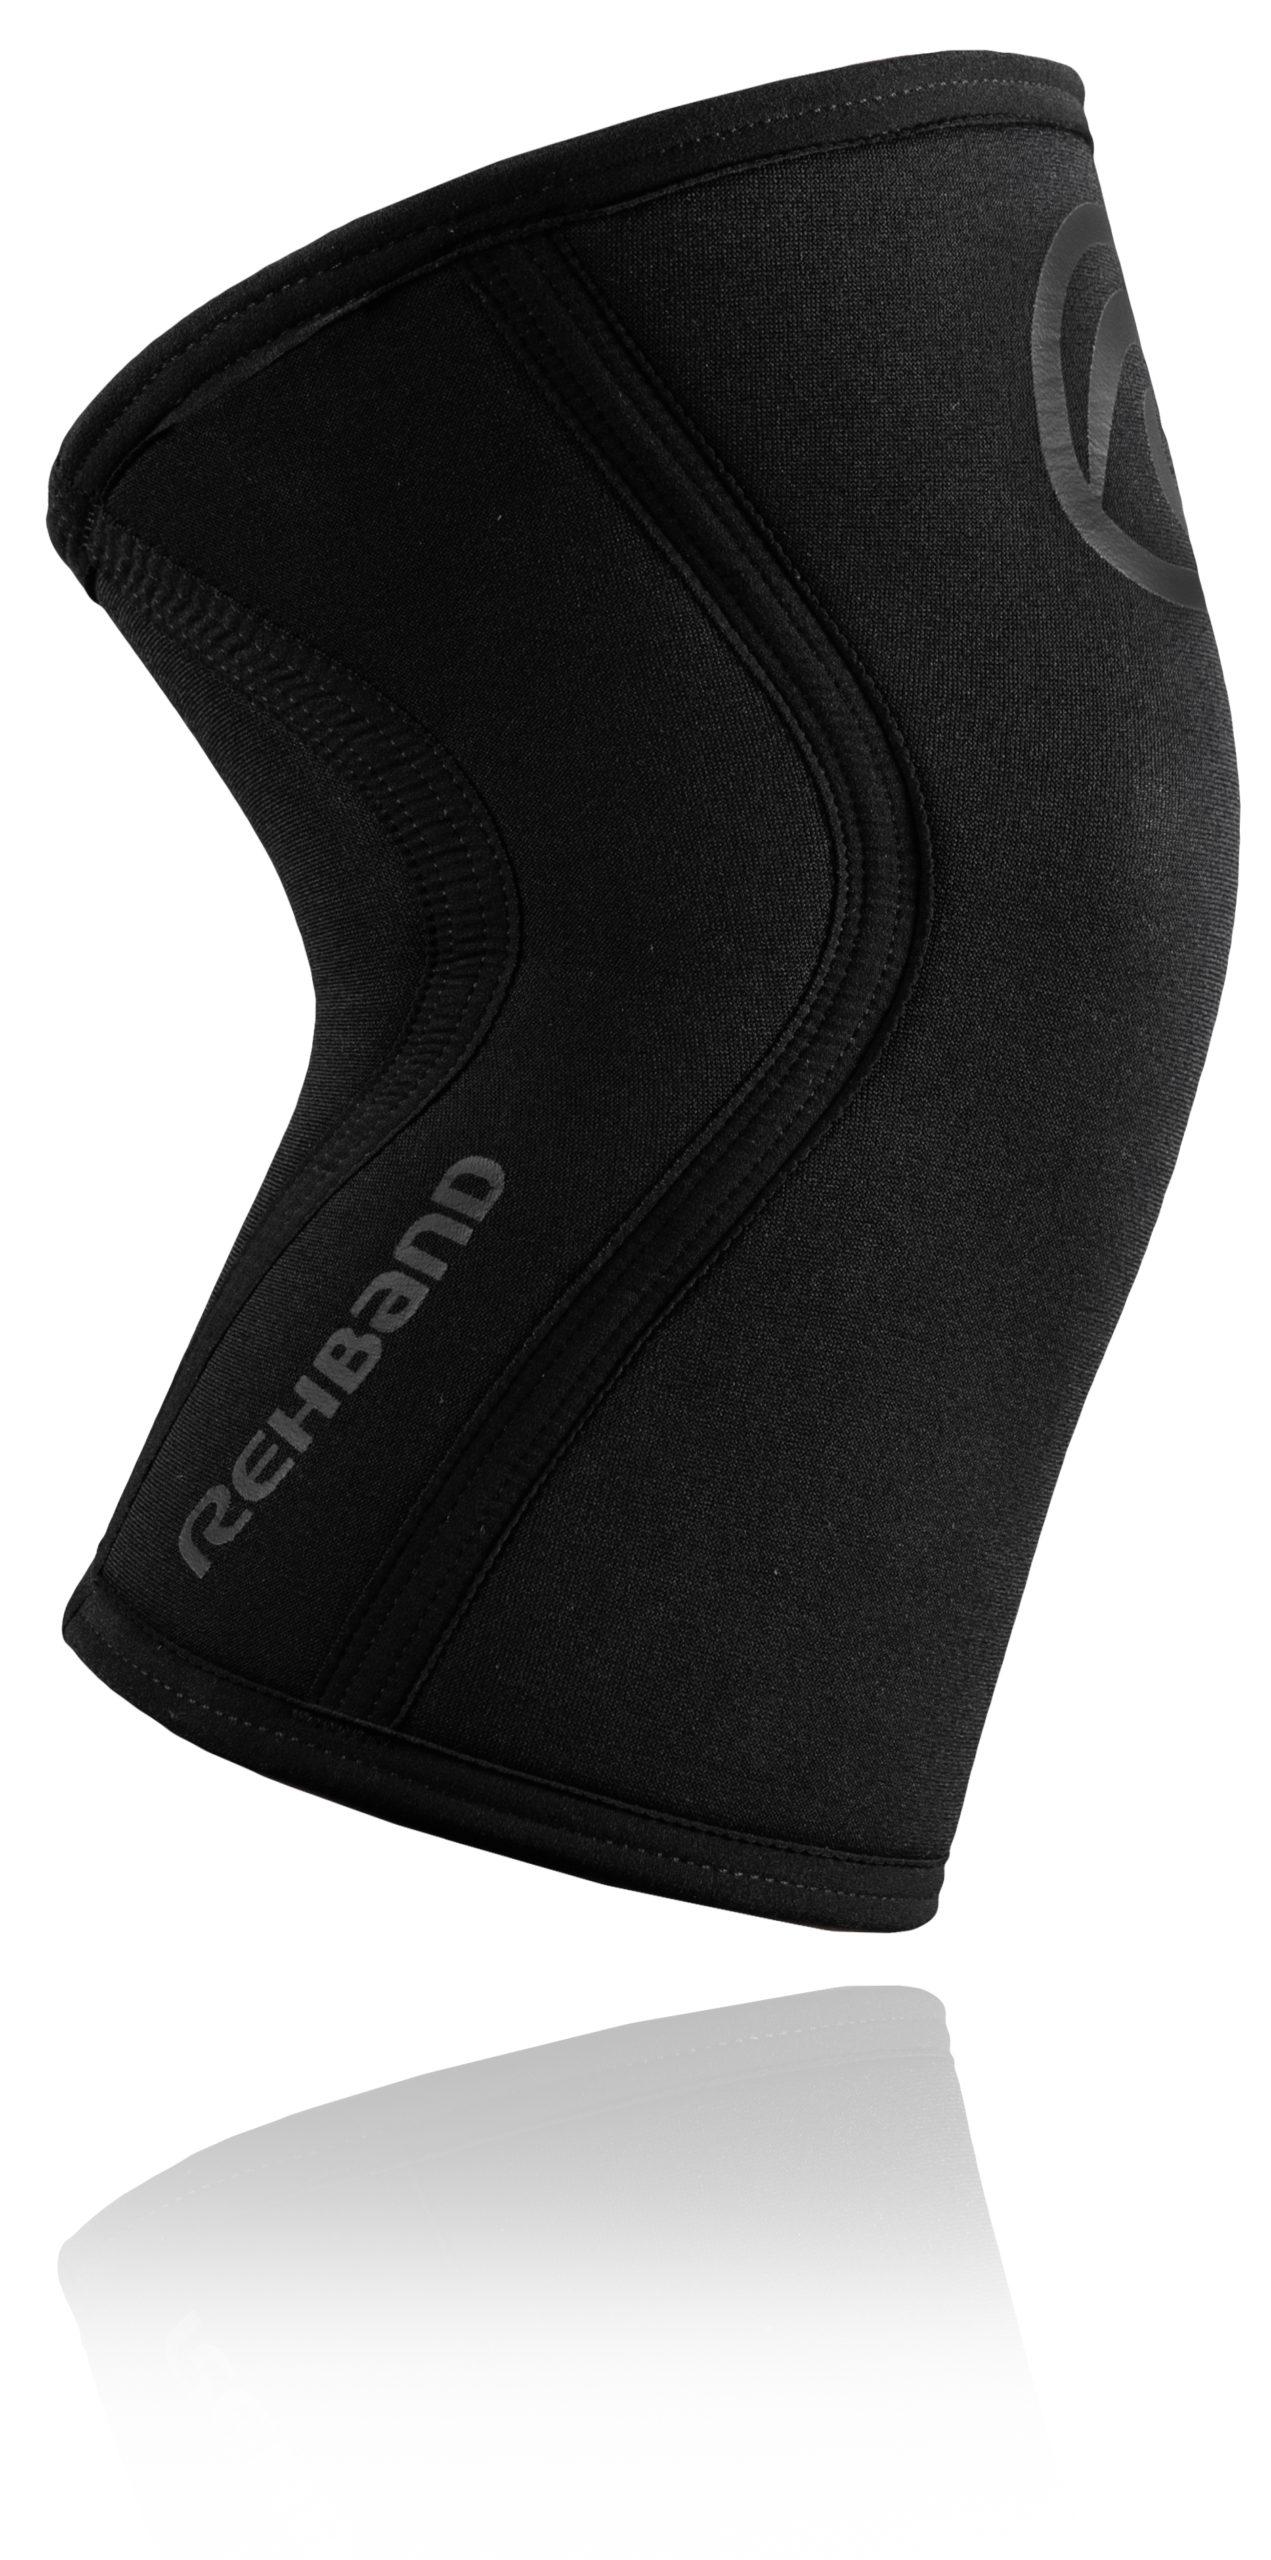 Black 5mm Rehband 105306 Rx Knee Sleeve